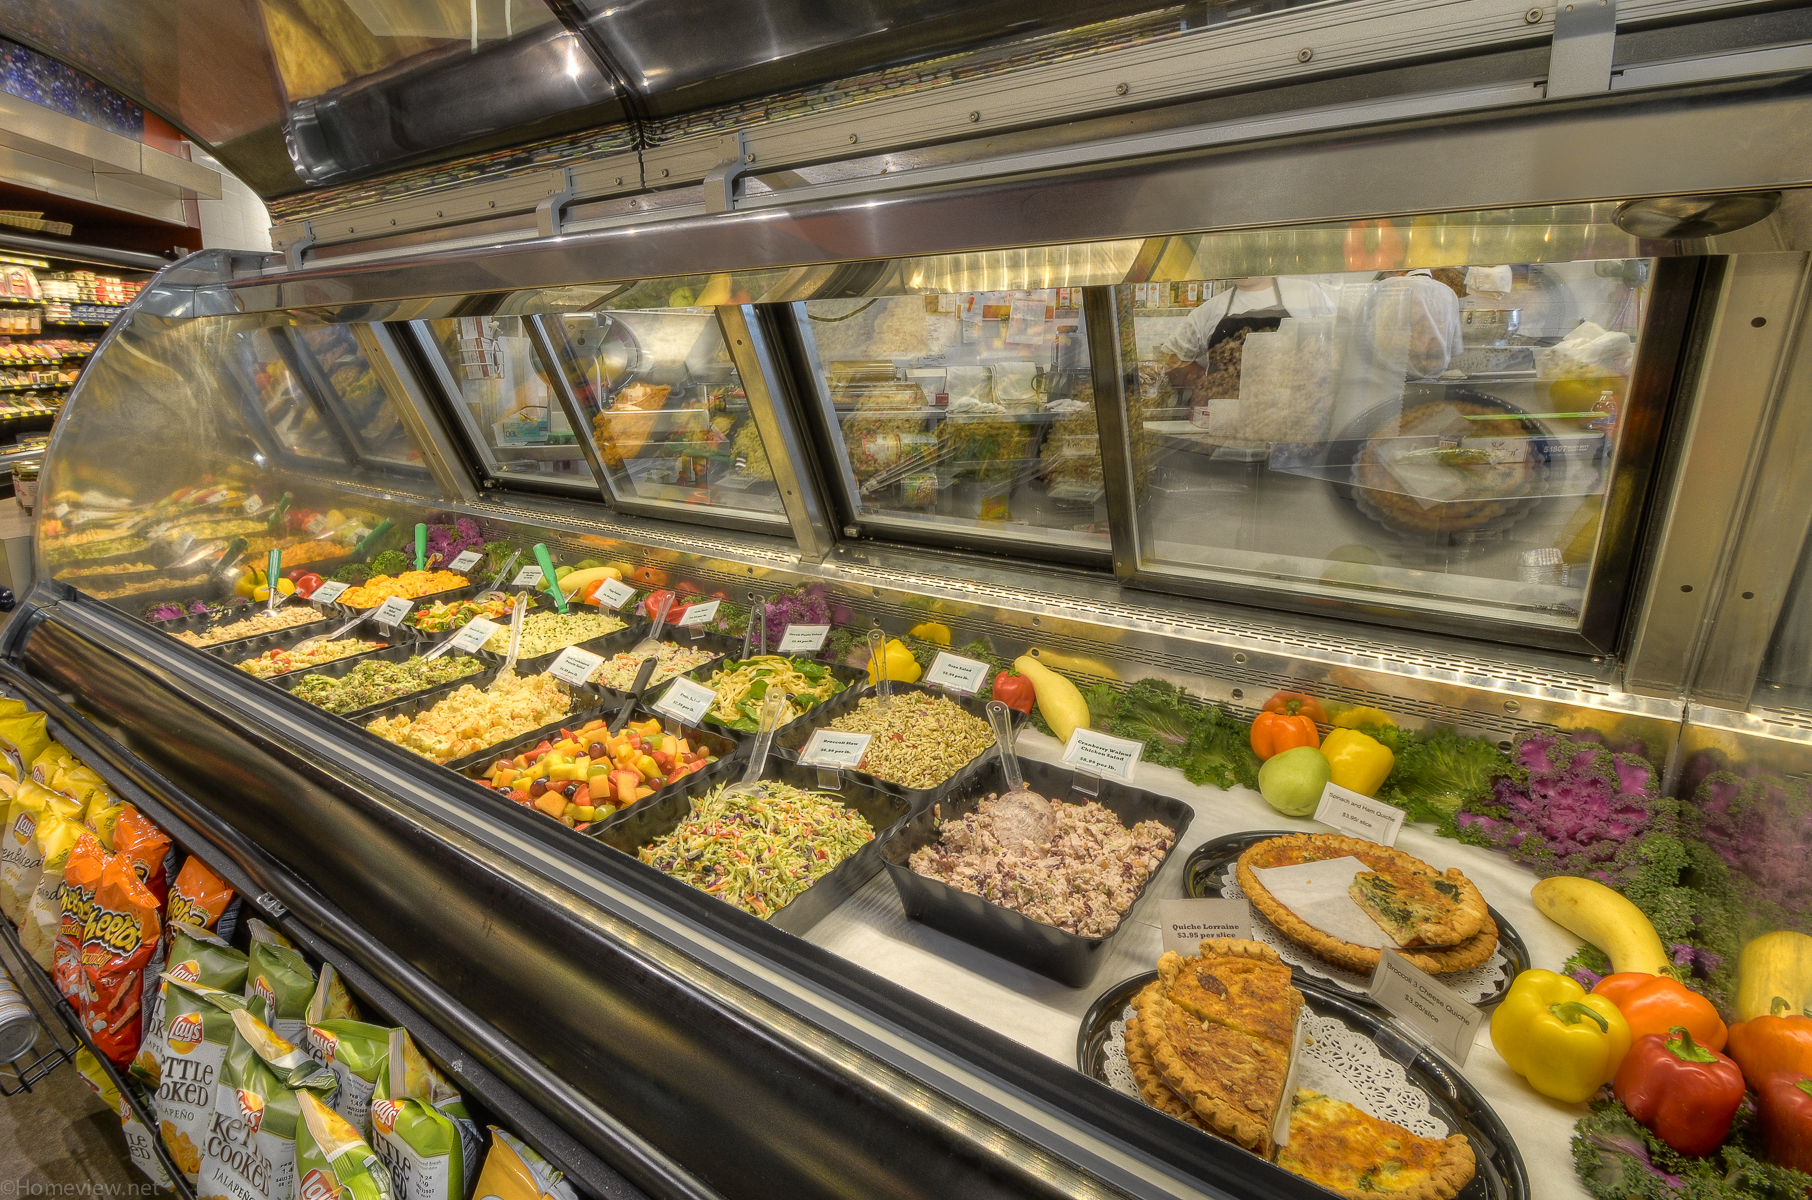 Cold Deli Salads at Bayside Fresh Market